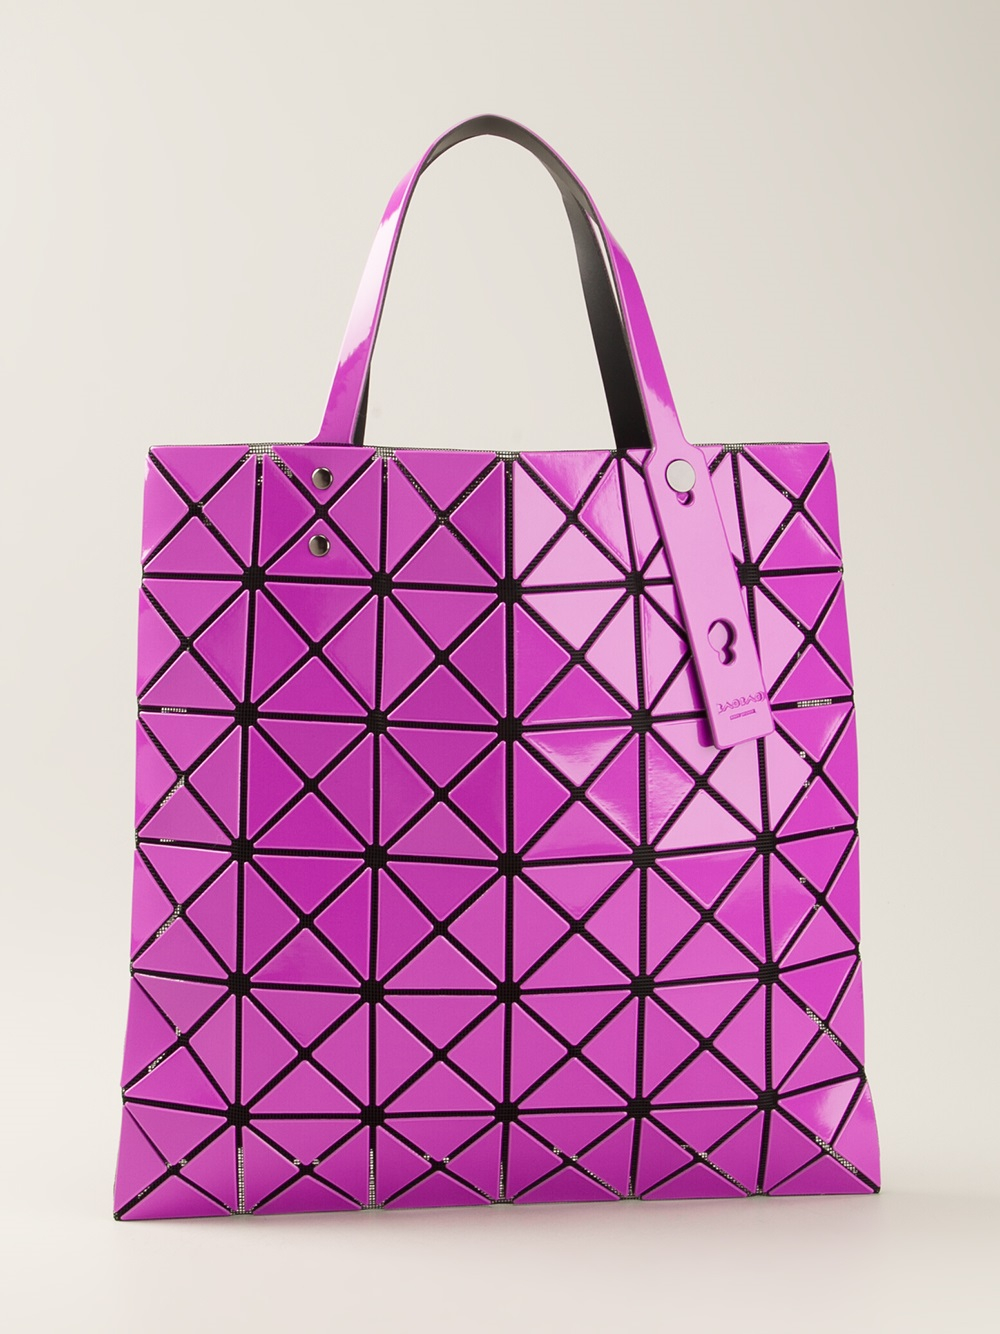 Lyst Bao Bao Issey Miyake Geometric Panel Tote Bag In Pink